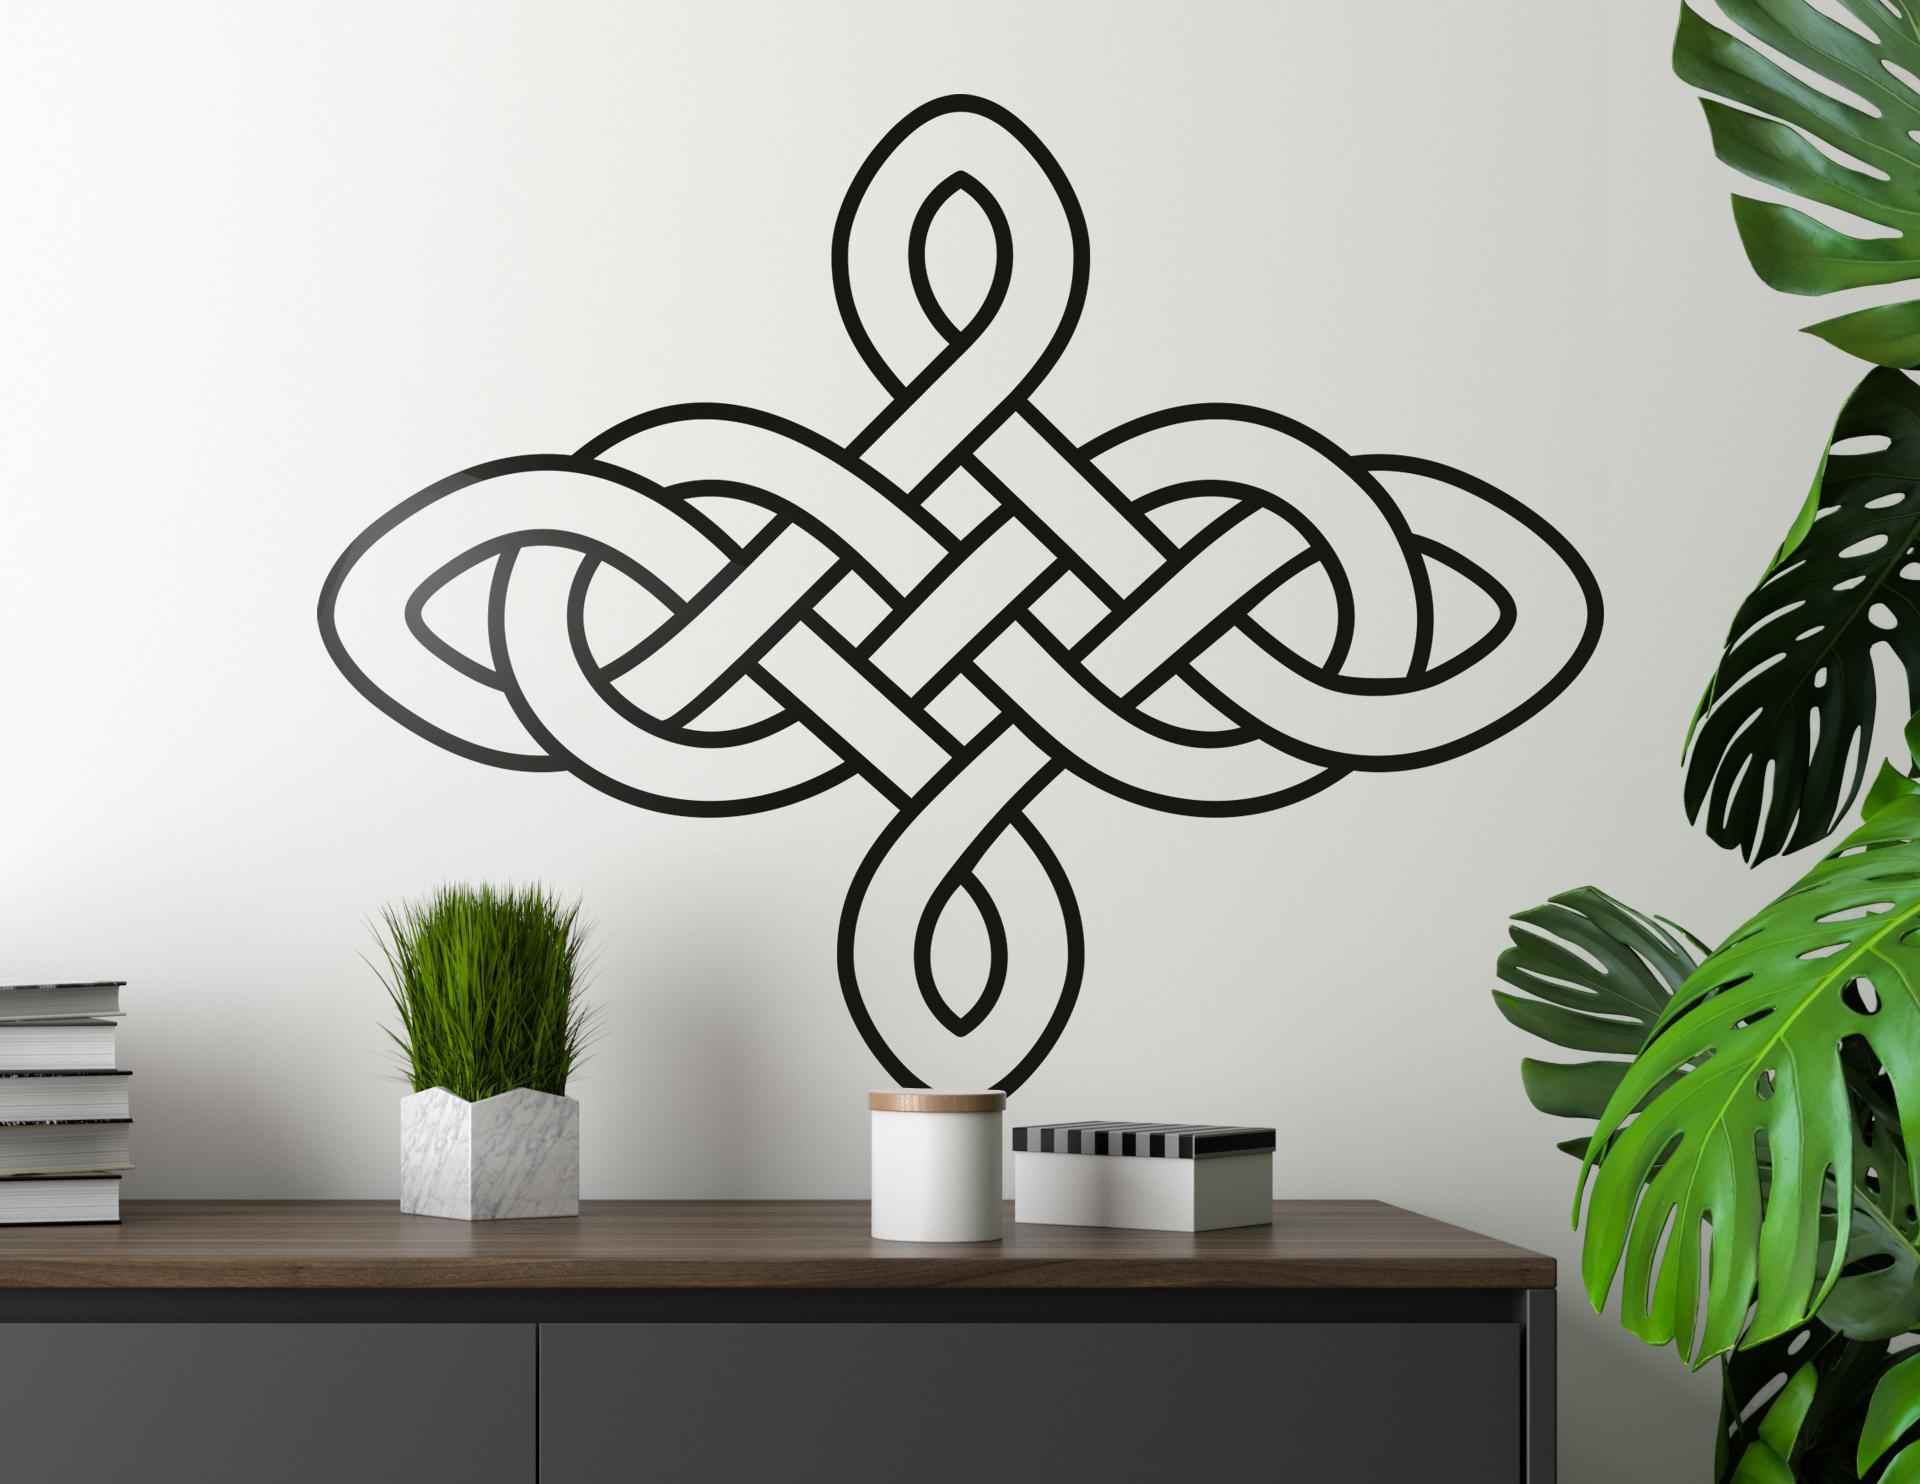 wandtattoo keltischer knoten 03. Black Bedroom Furniture Sets. Home Design Ideas